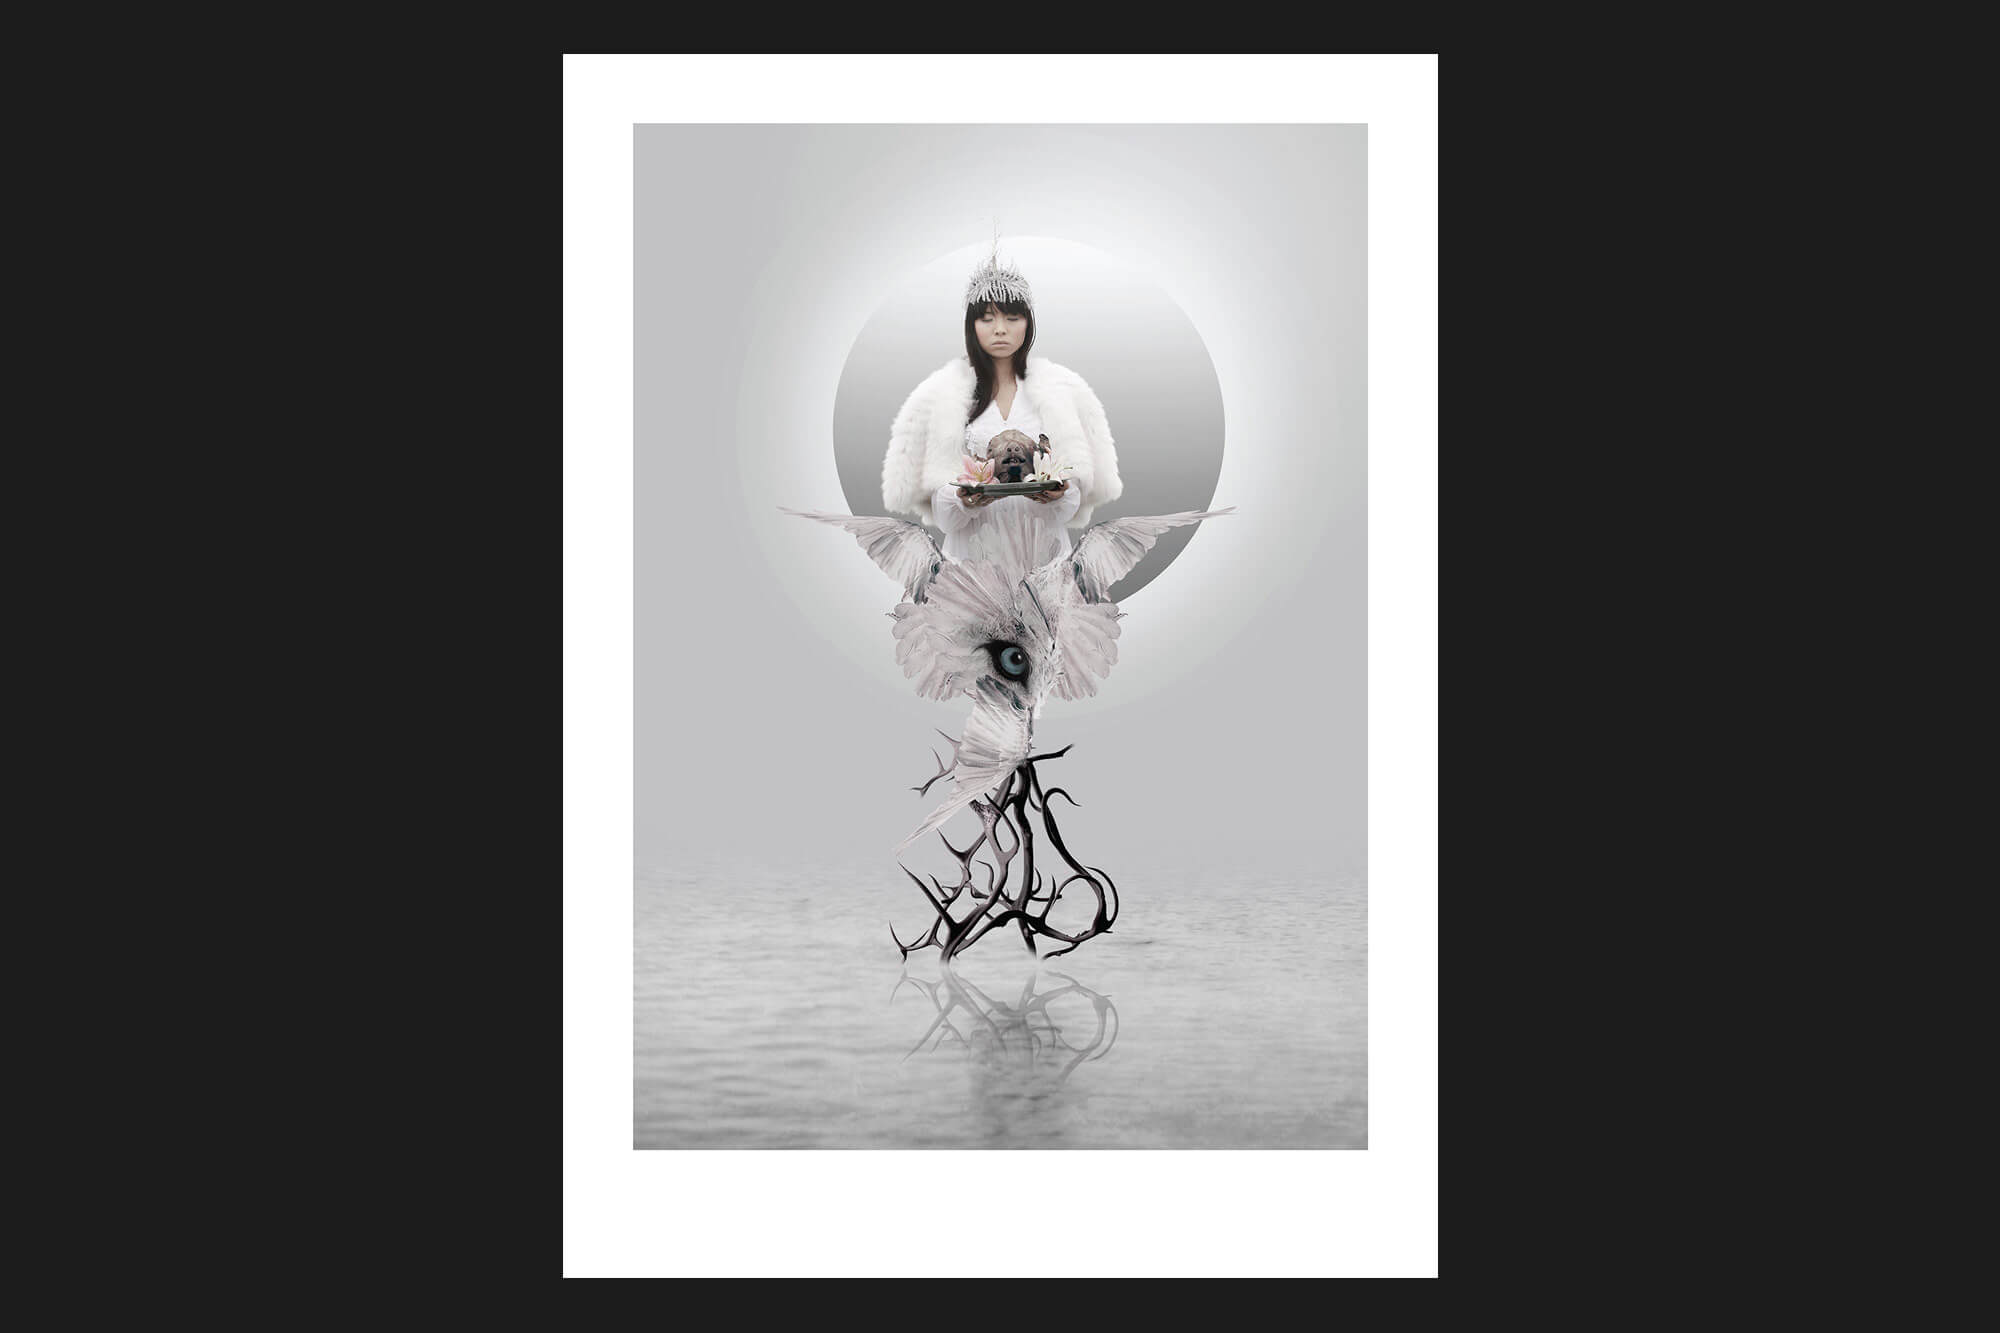 gareth-paul-jones-studio-design-neringa-rekasiute-photography-7788-art-identity-series-cs-08